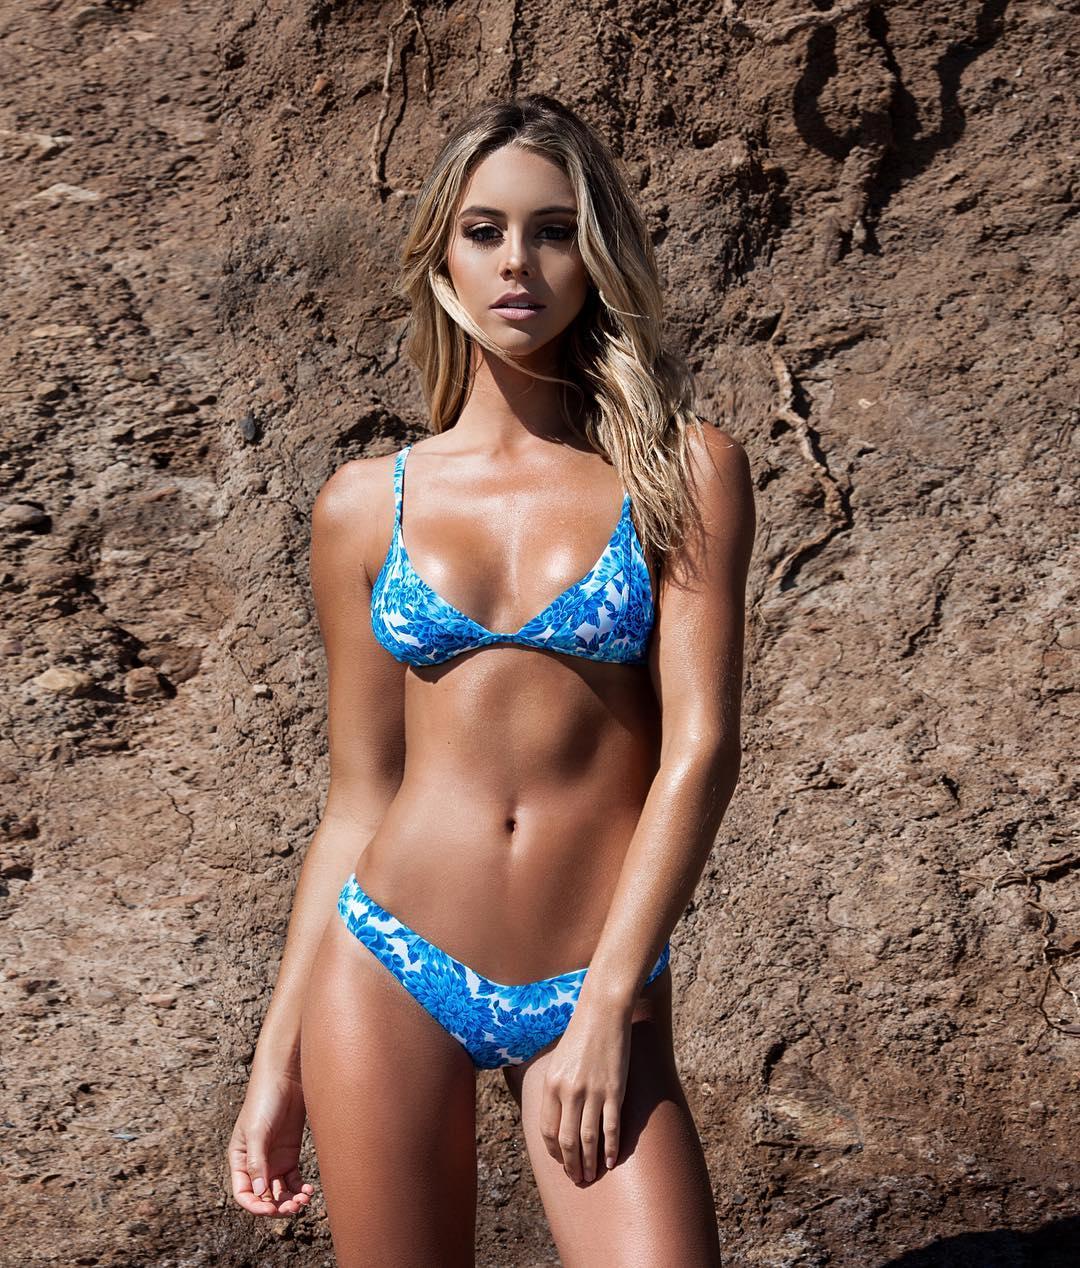 La surfeuse sexy Bree Kleintop sur Instagram hot nude thong string bikini